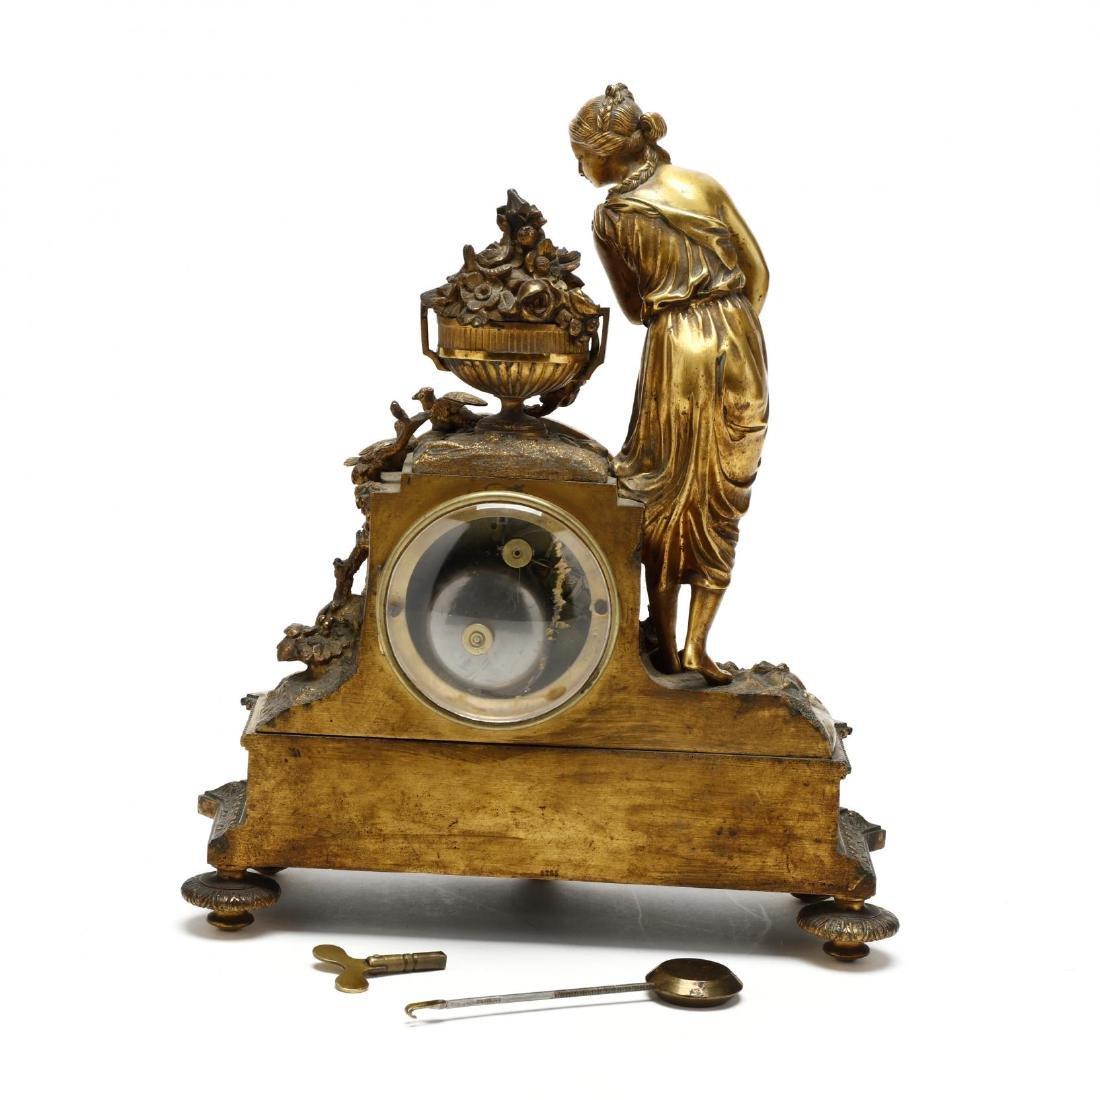 Antique French Gilt Bronze Figural Mantel Clock - 5